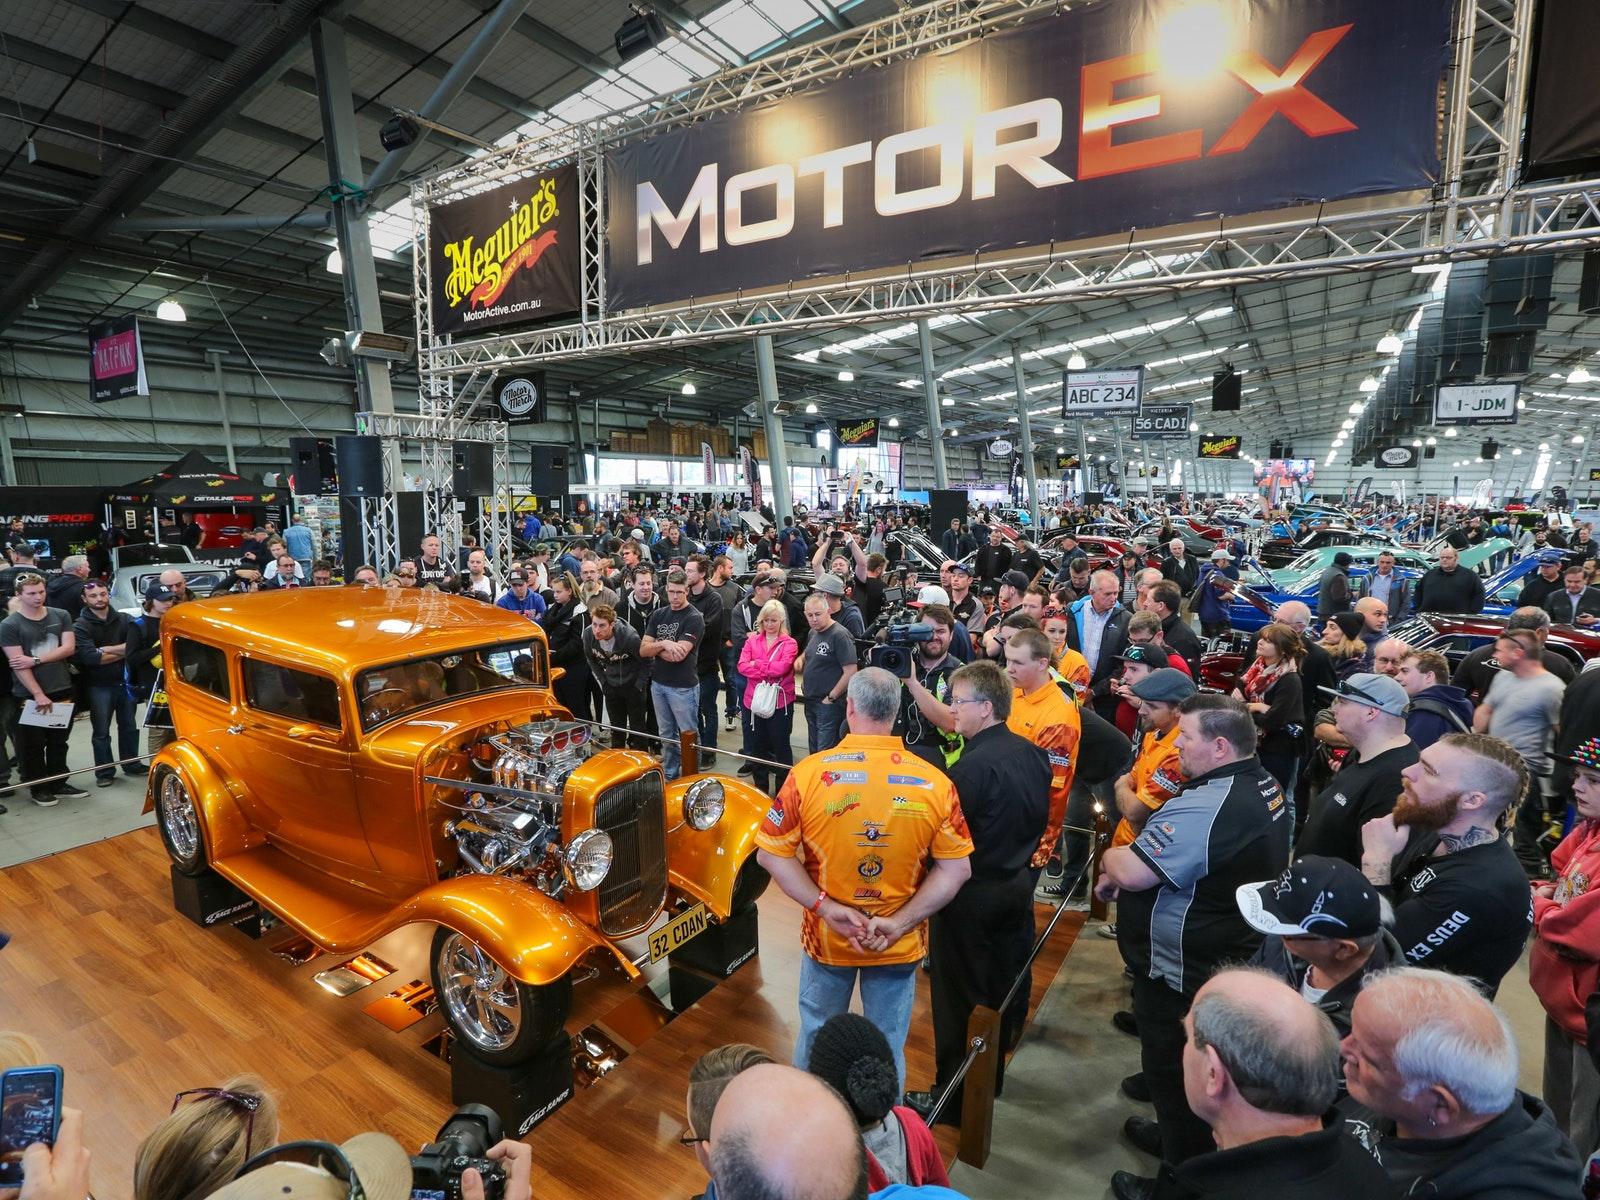 MotorEx Melbourne